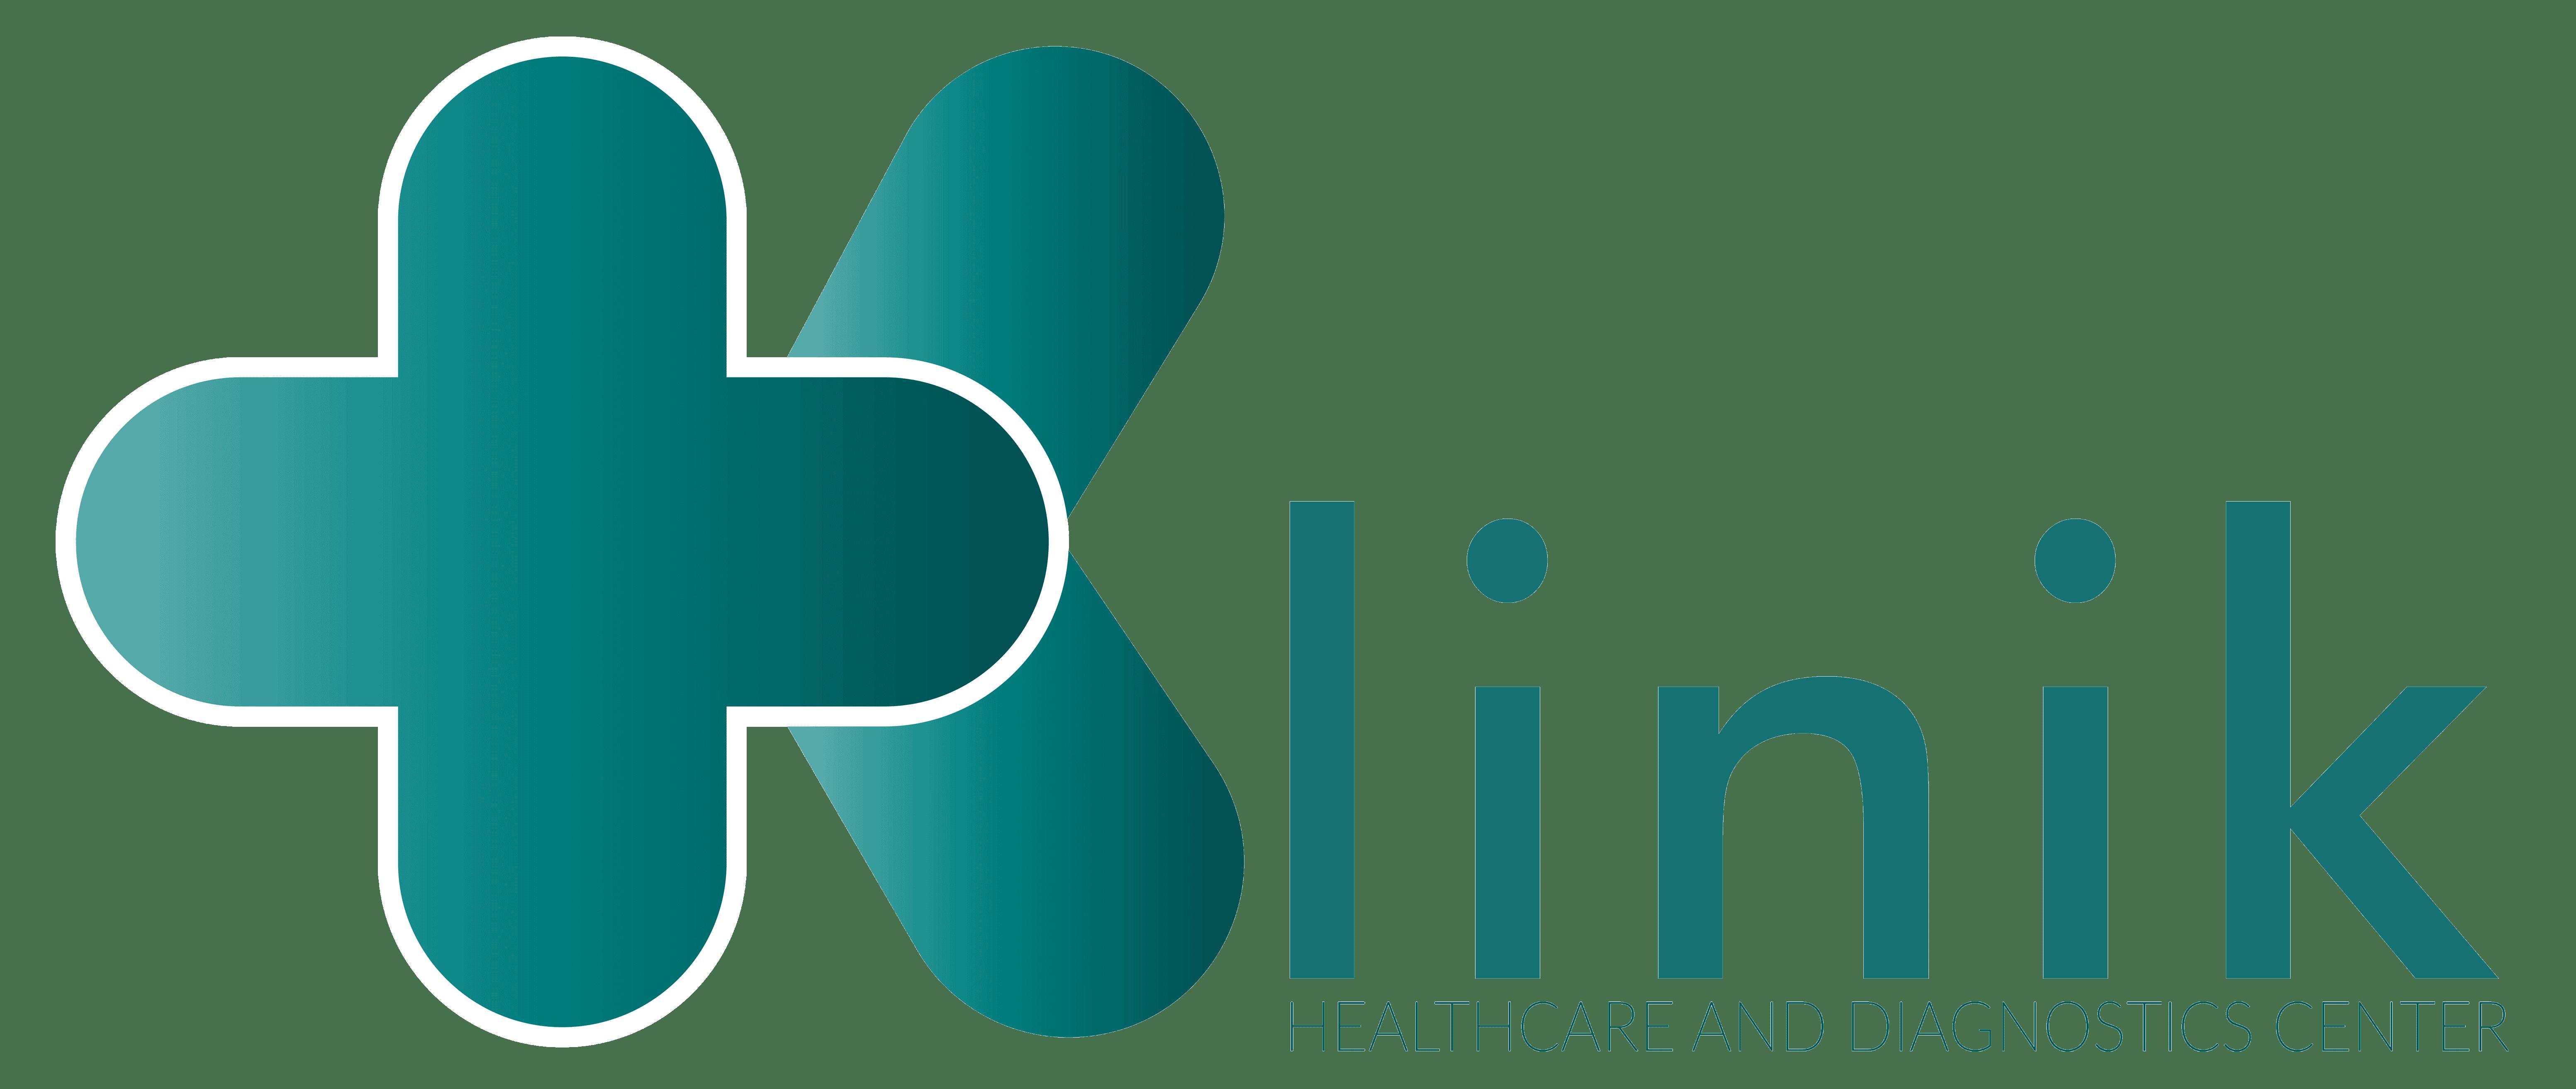 Klinik Healthcare and Diagnostic Center